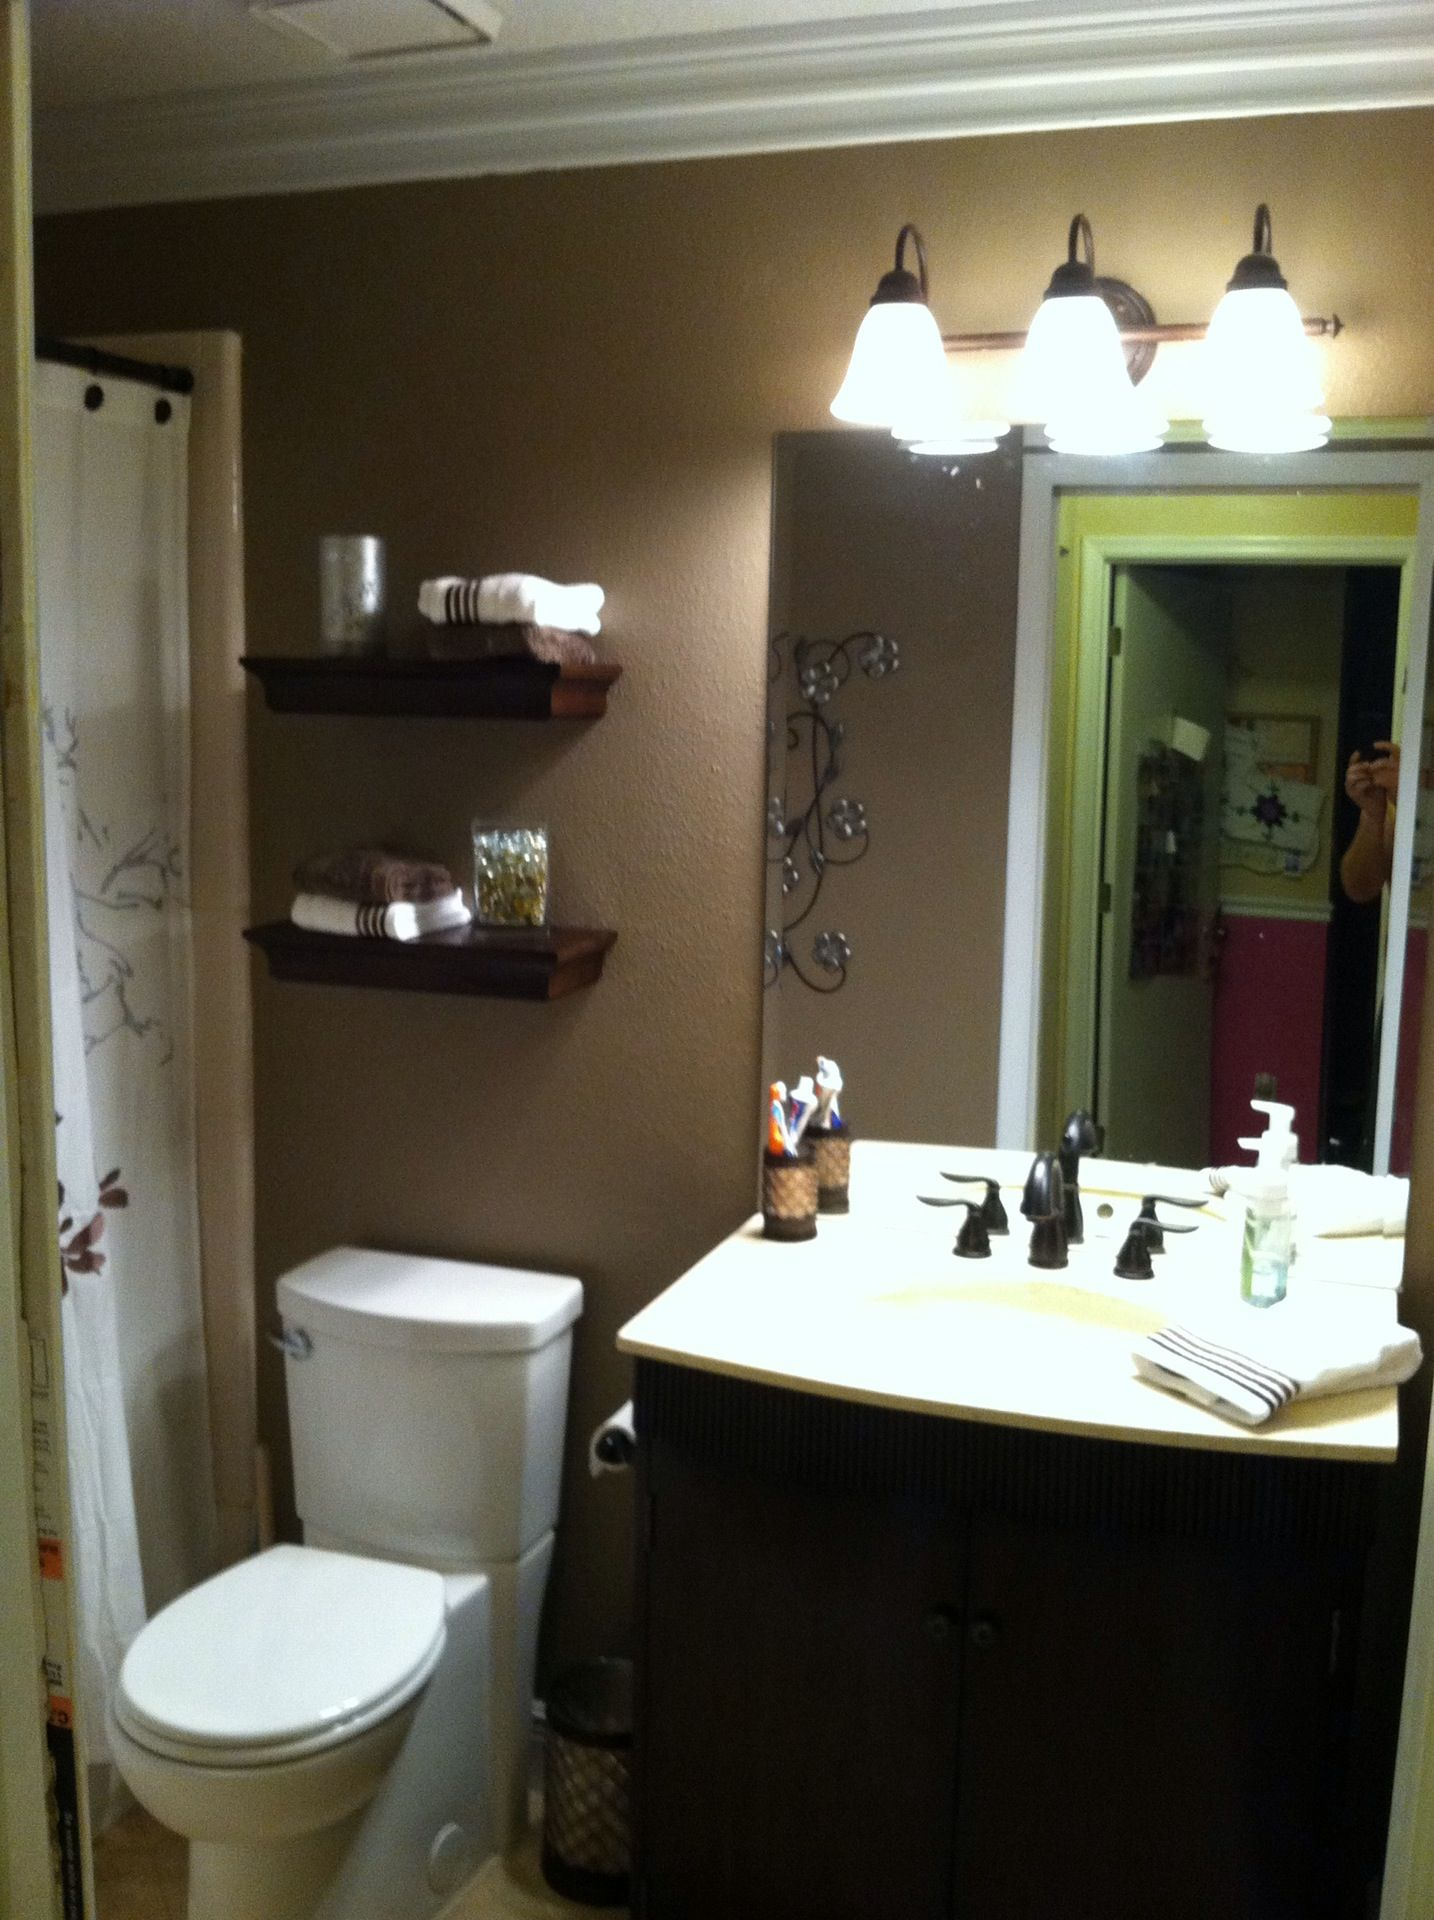 small bathroom remodel ideas bathroom ideas pinterest. Black Bedroom Furniture Sets. Home Design Ideas